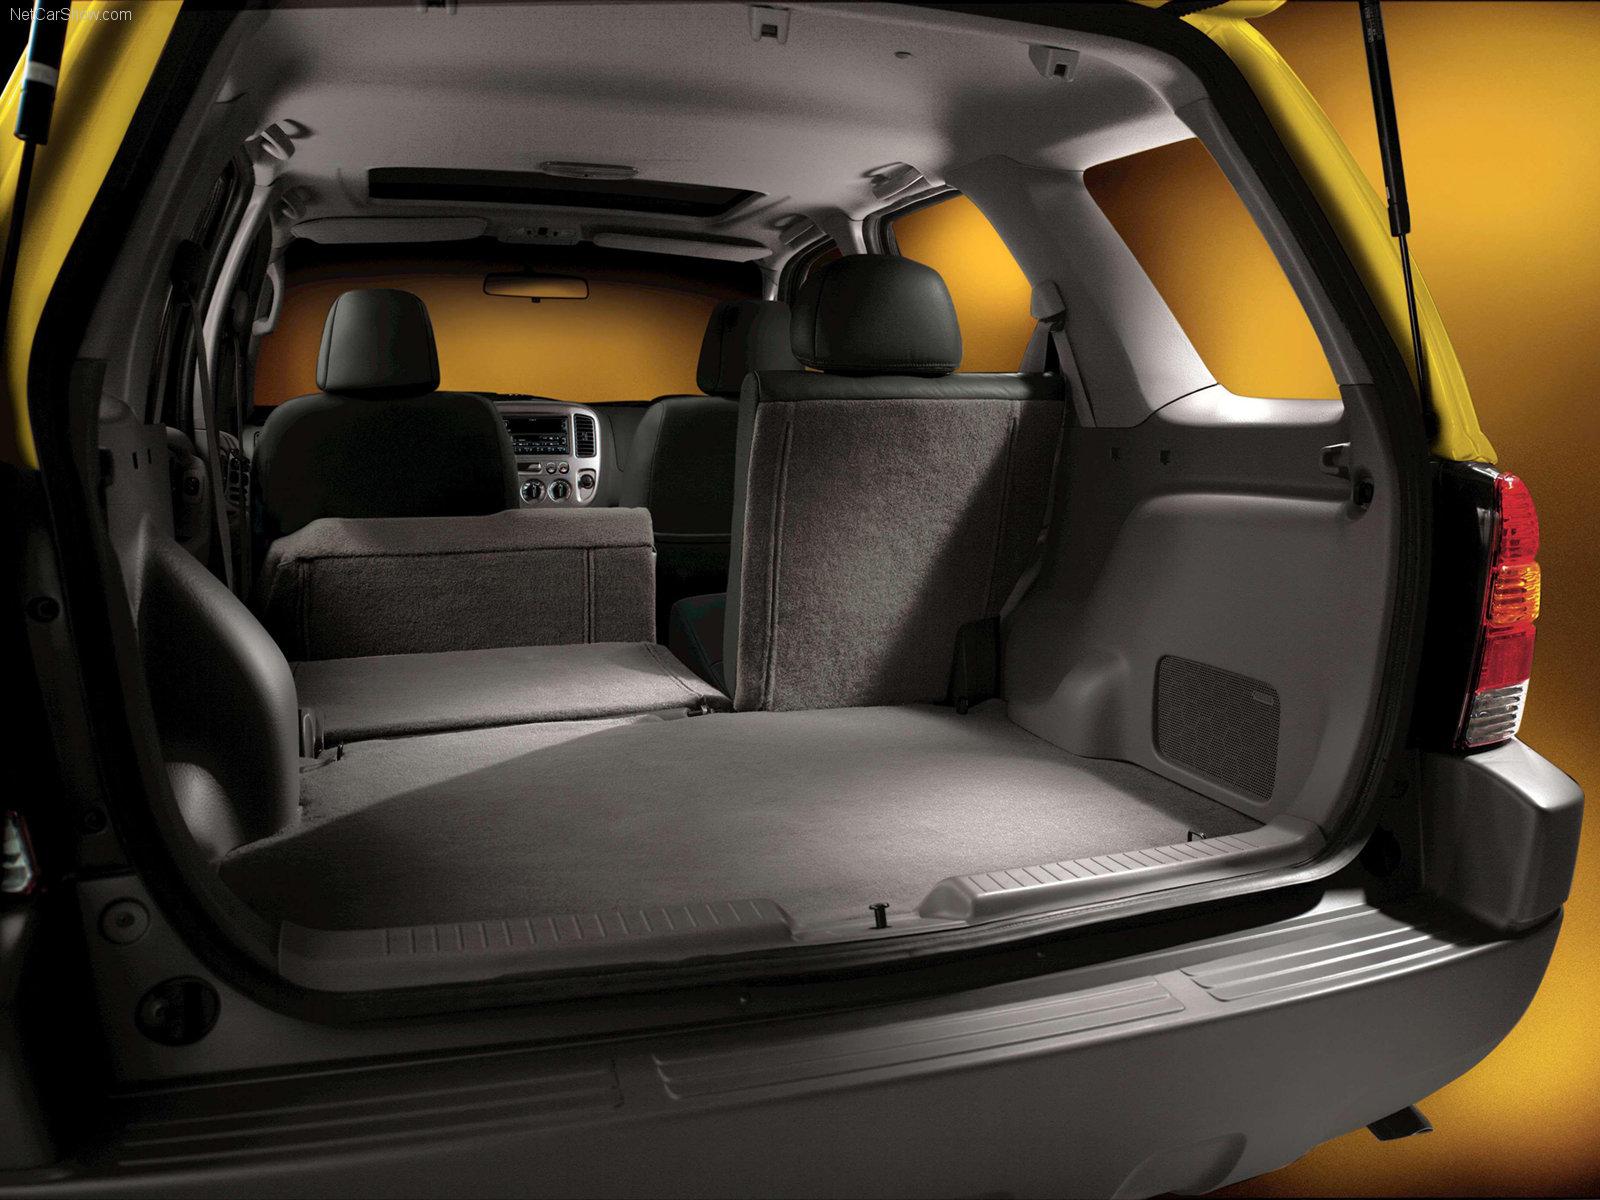 Форд Эскейп 2008, 2.3 литра, Авто приобреталось с салона ...